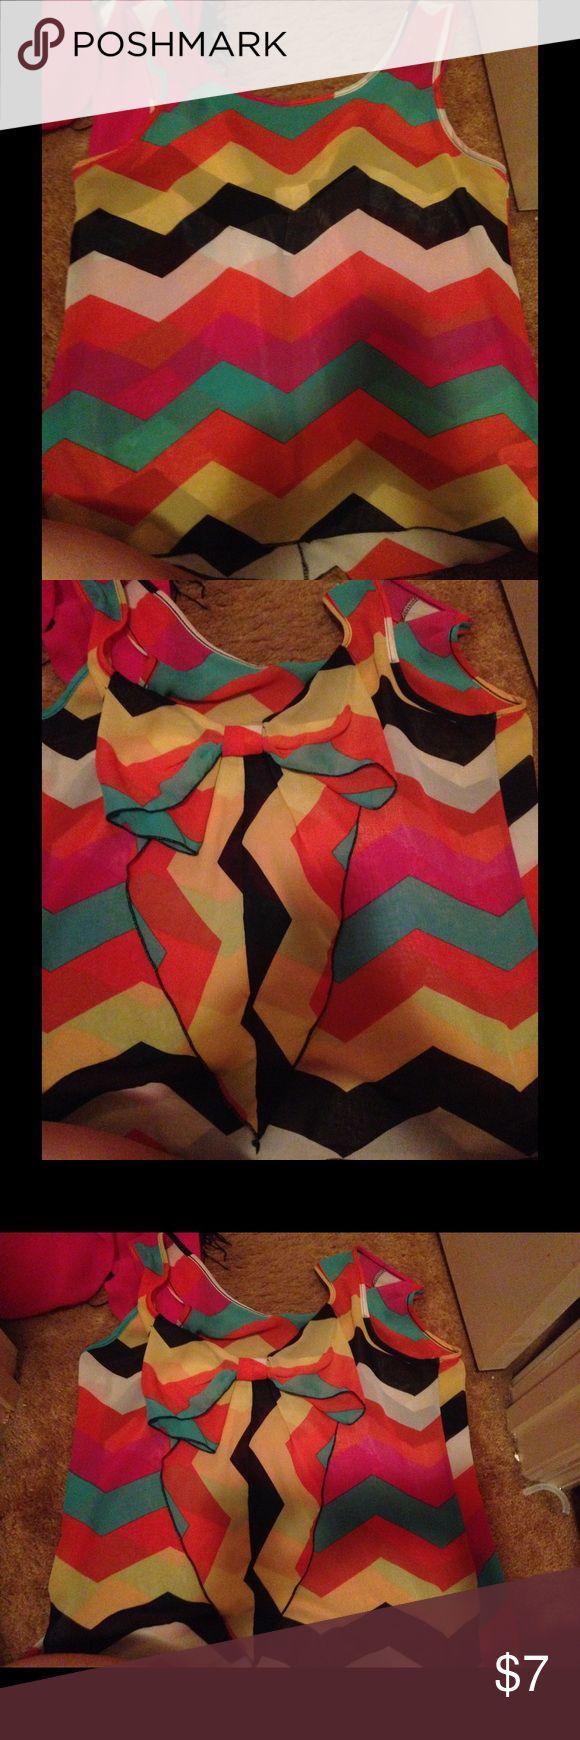 Boutique bow back top So cute! Great condition 11 By Boris Bidjan Saberi Tops Blouses